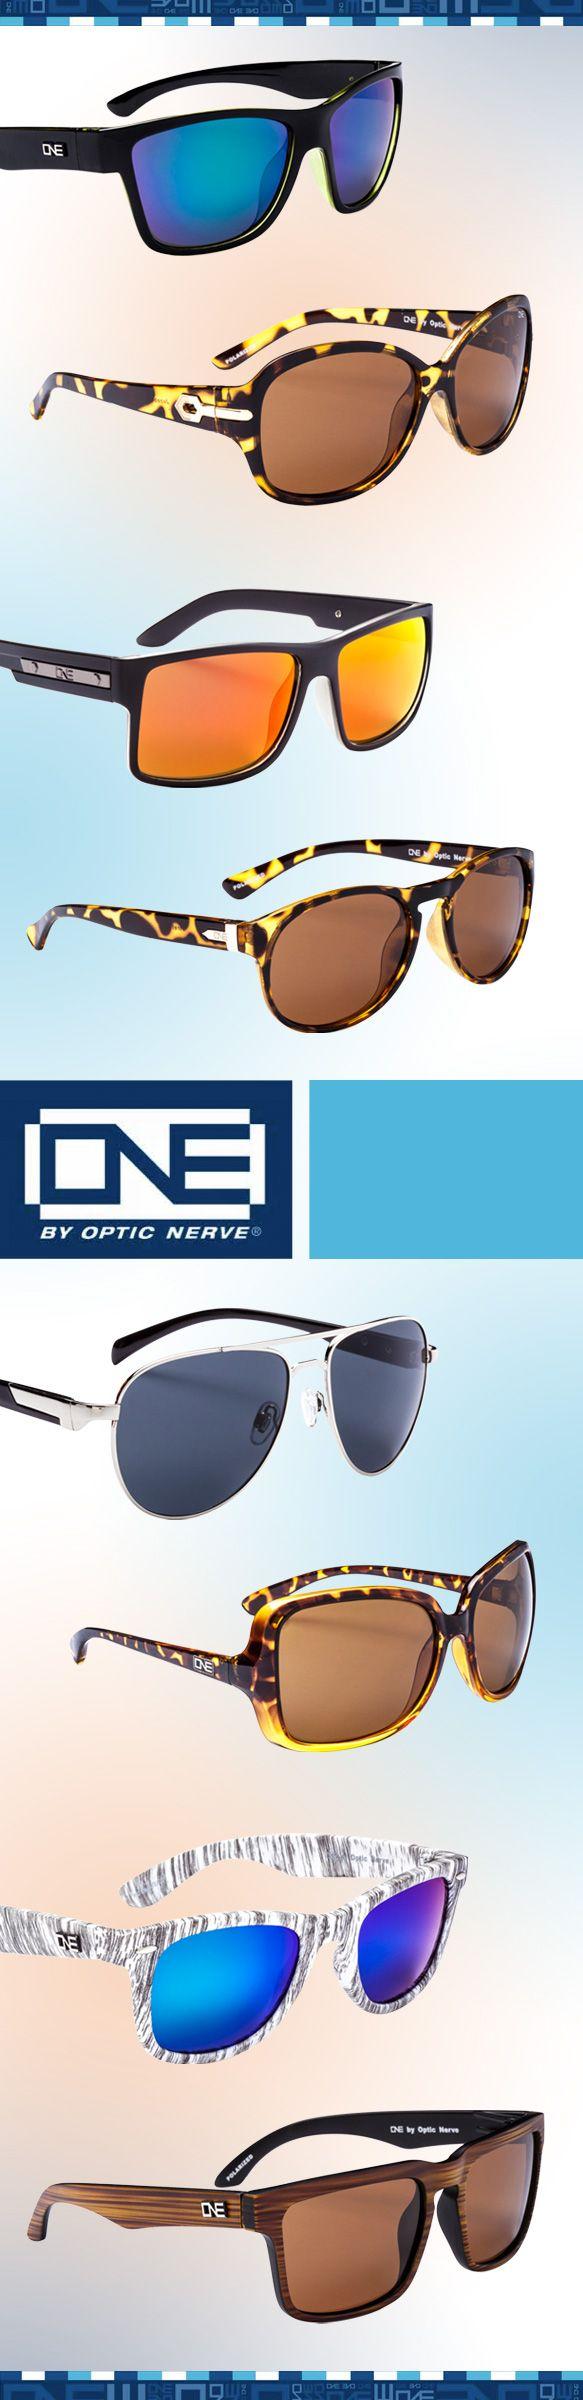 Introducing ONE by Optic Nerve: http://eyecessorizeblog.com/?p=6081